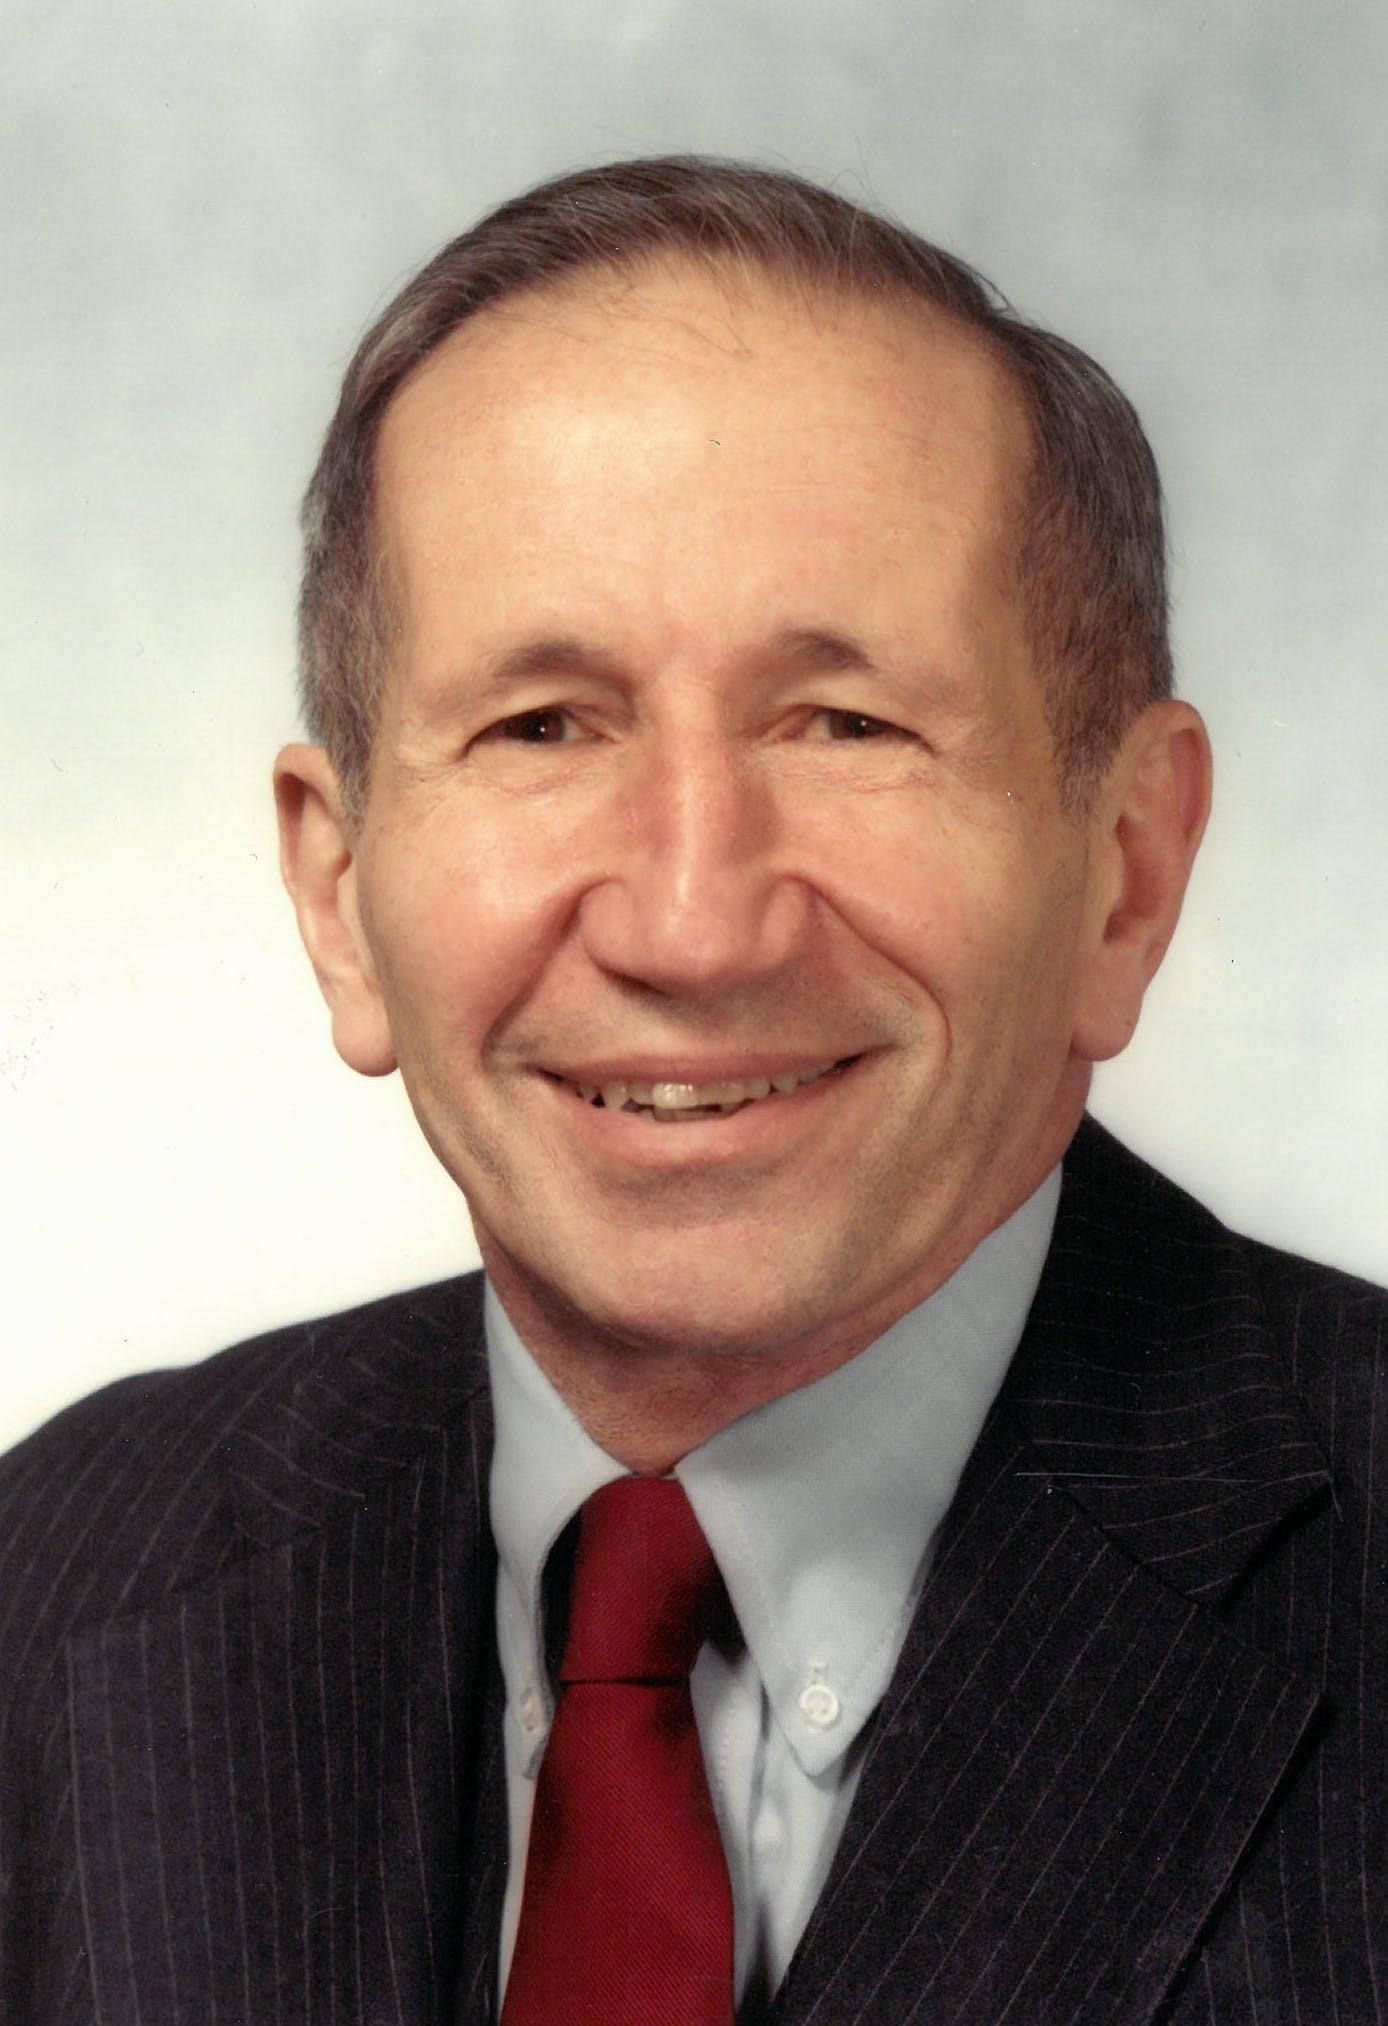 Arnold Morelli